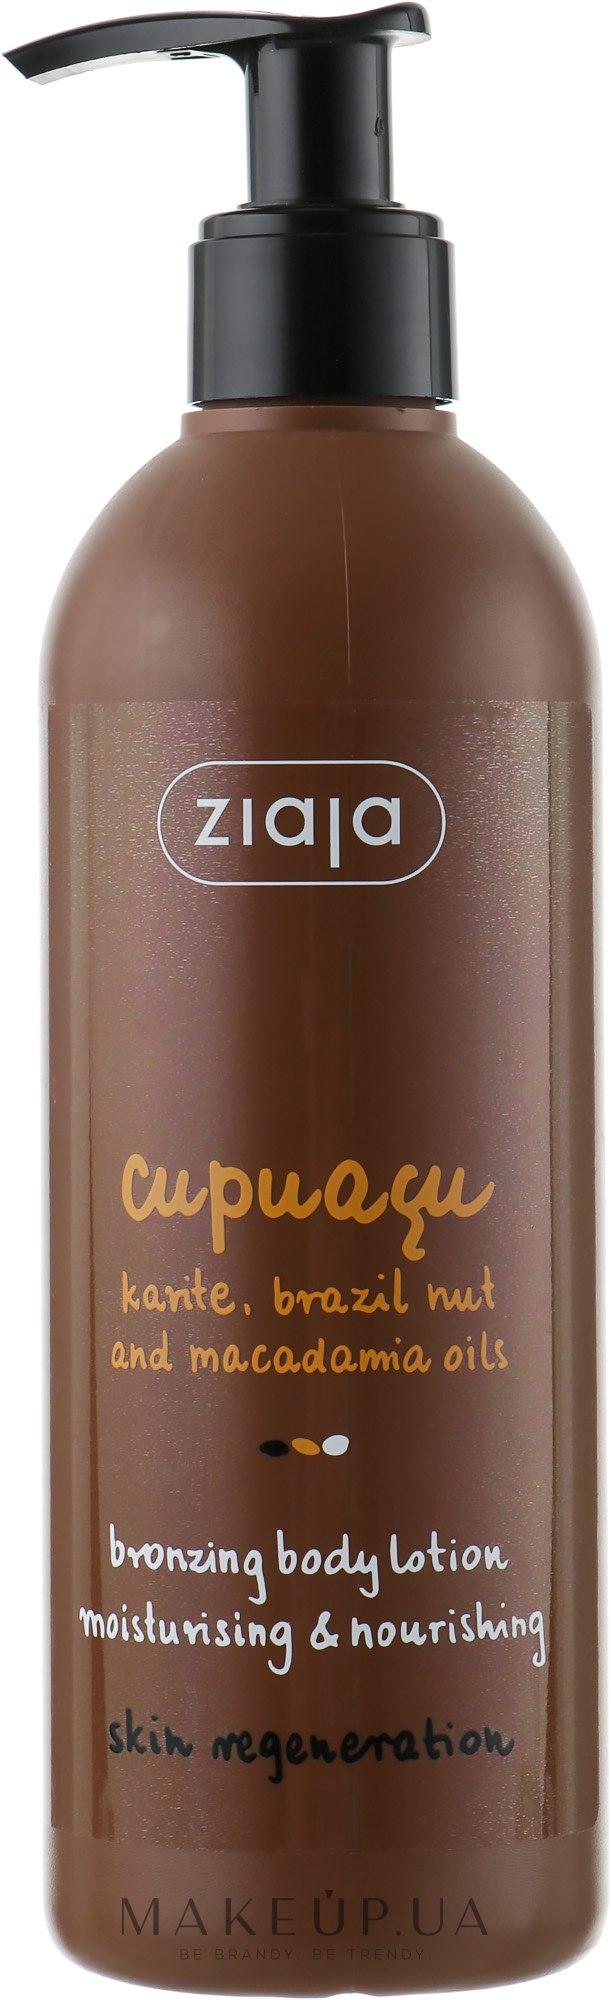 Бронзирующий лосьон для тела - Ziaja Cupuacu Bronzing Body Lotion — фото 300ml